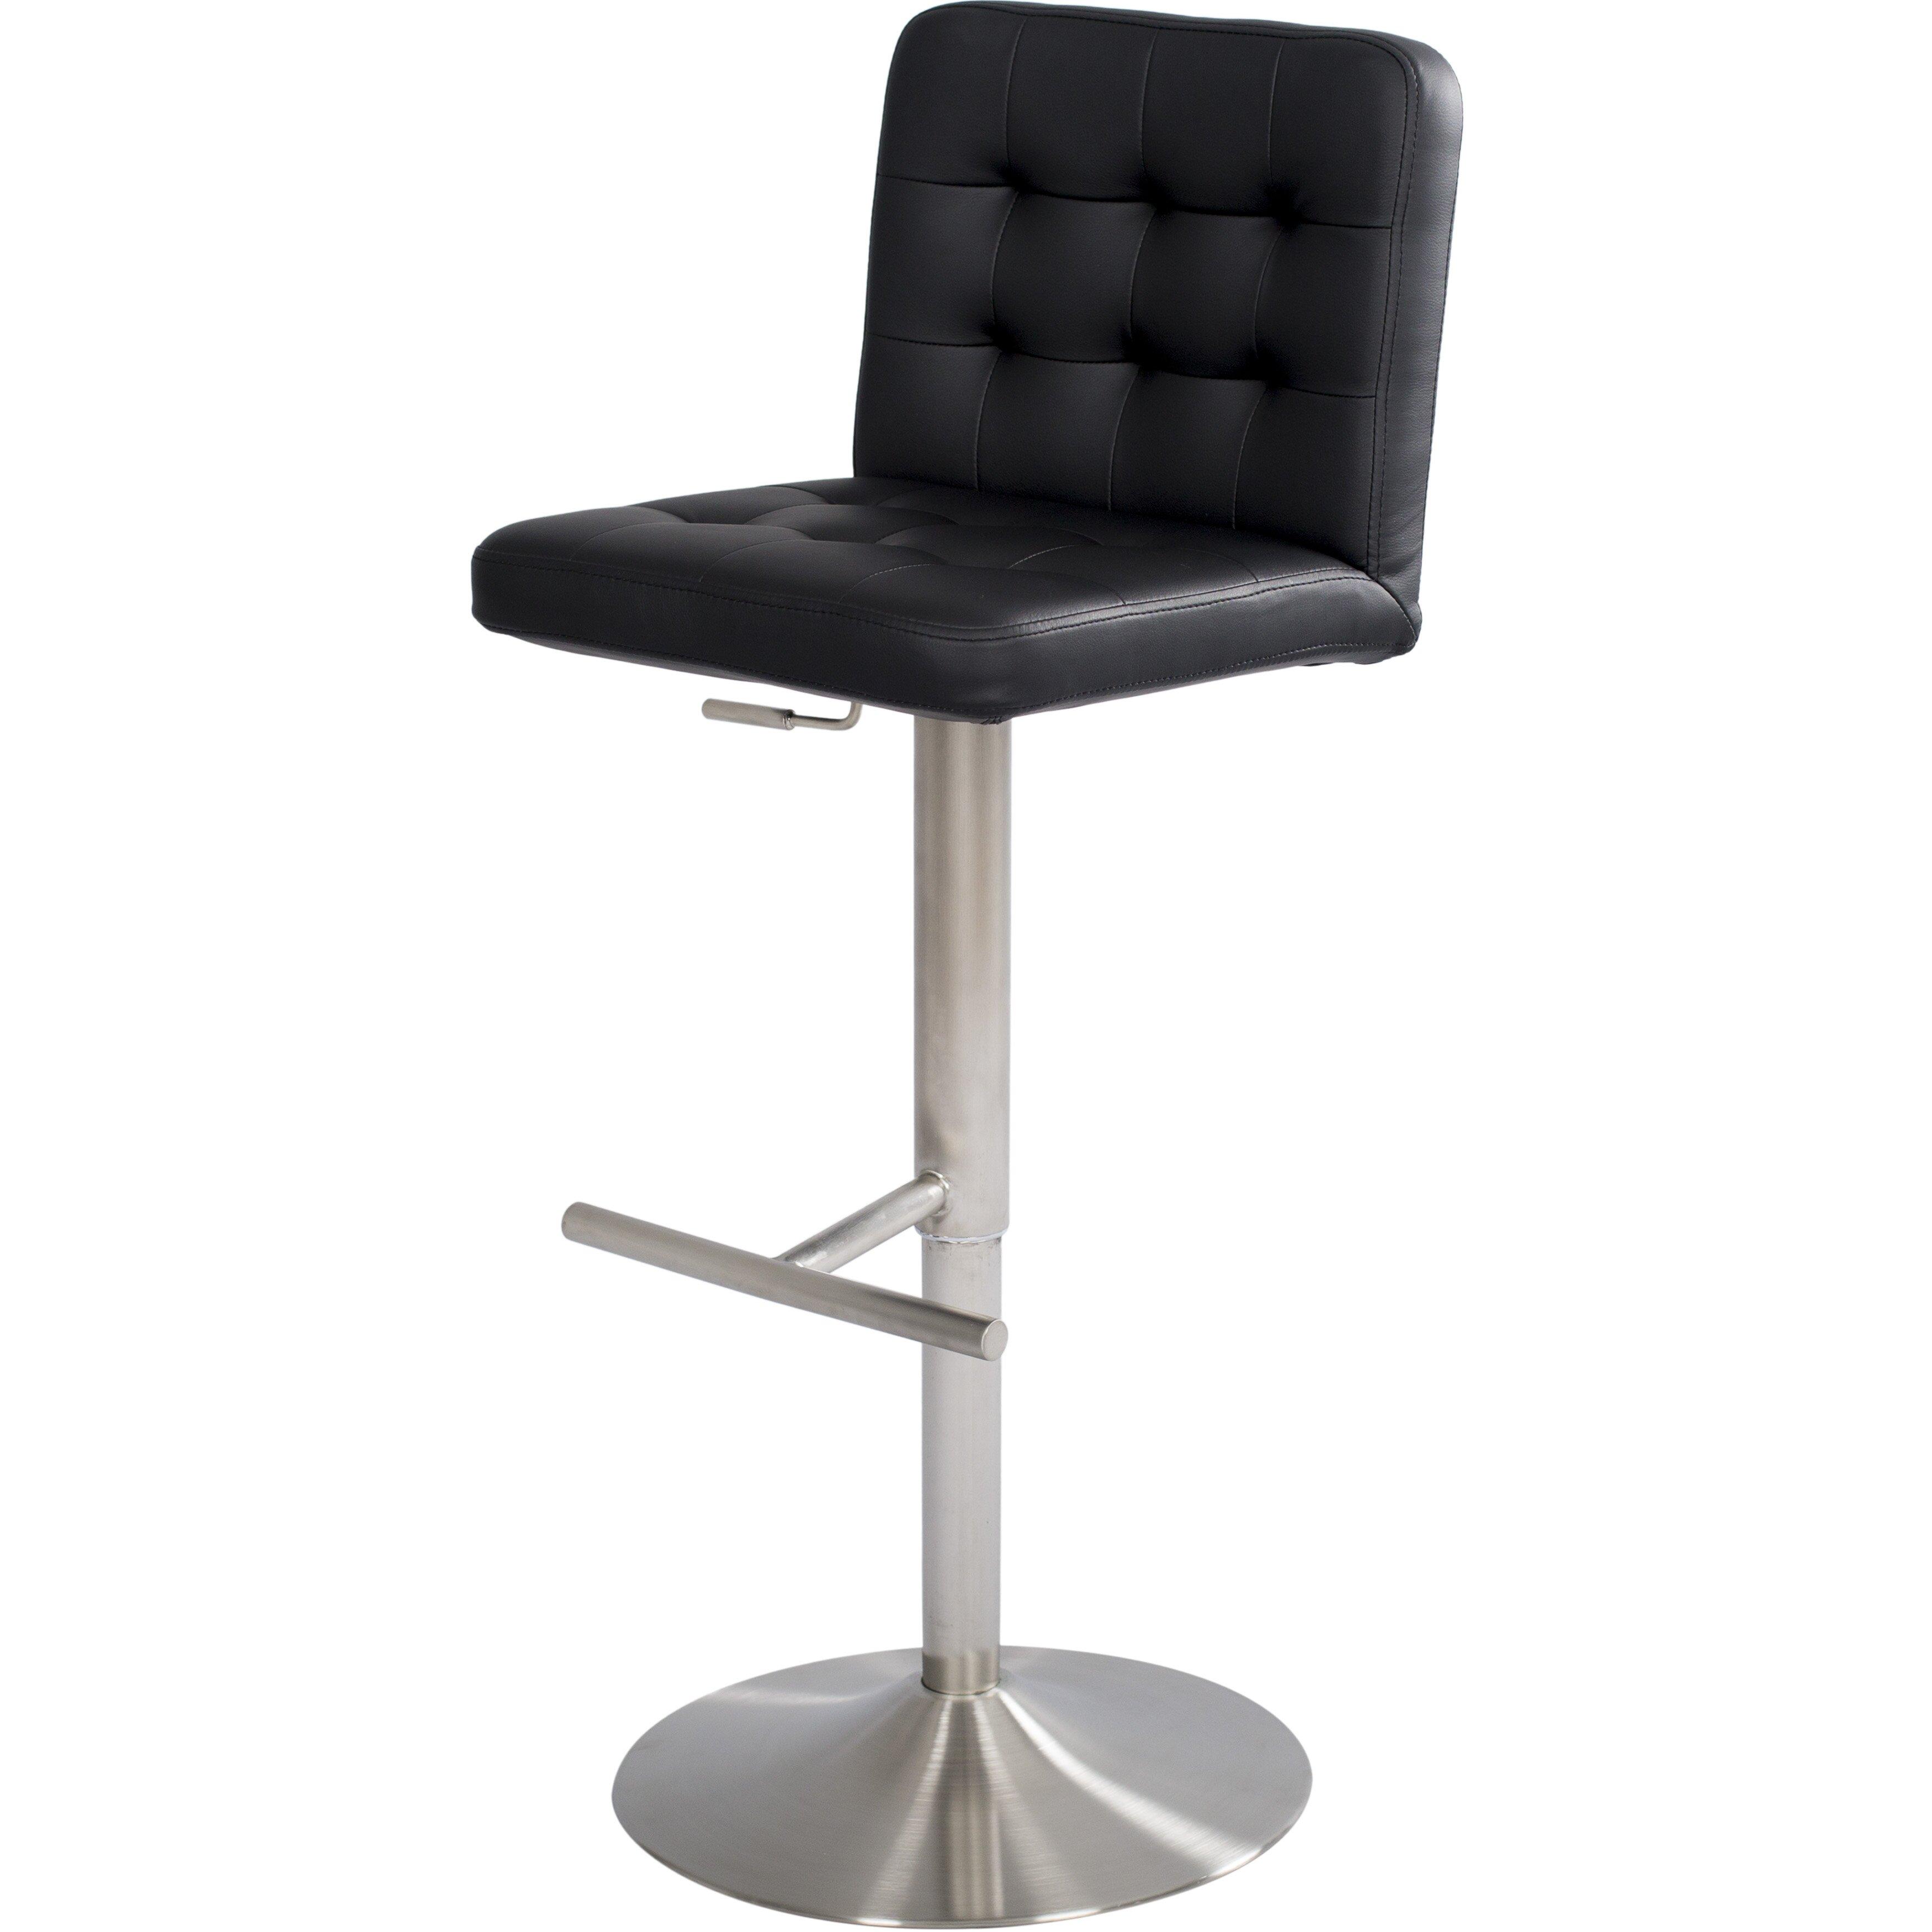 Matrix adjustable height swivel bar stool reviews wayfair for Adjustable height bar stools